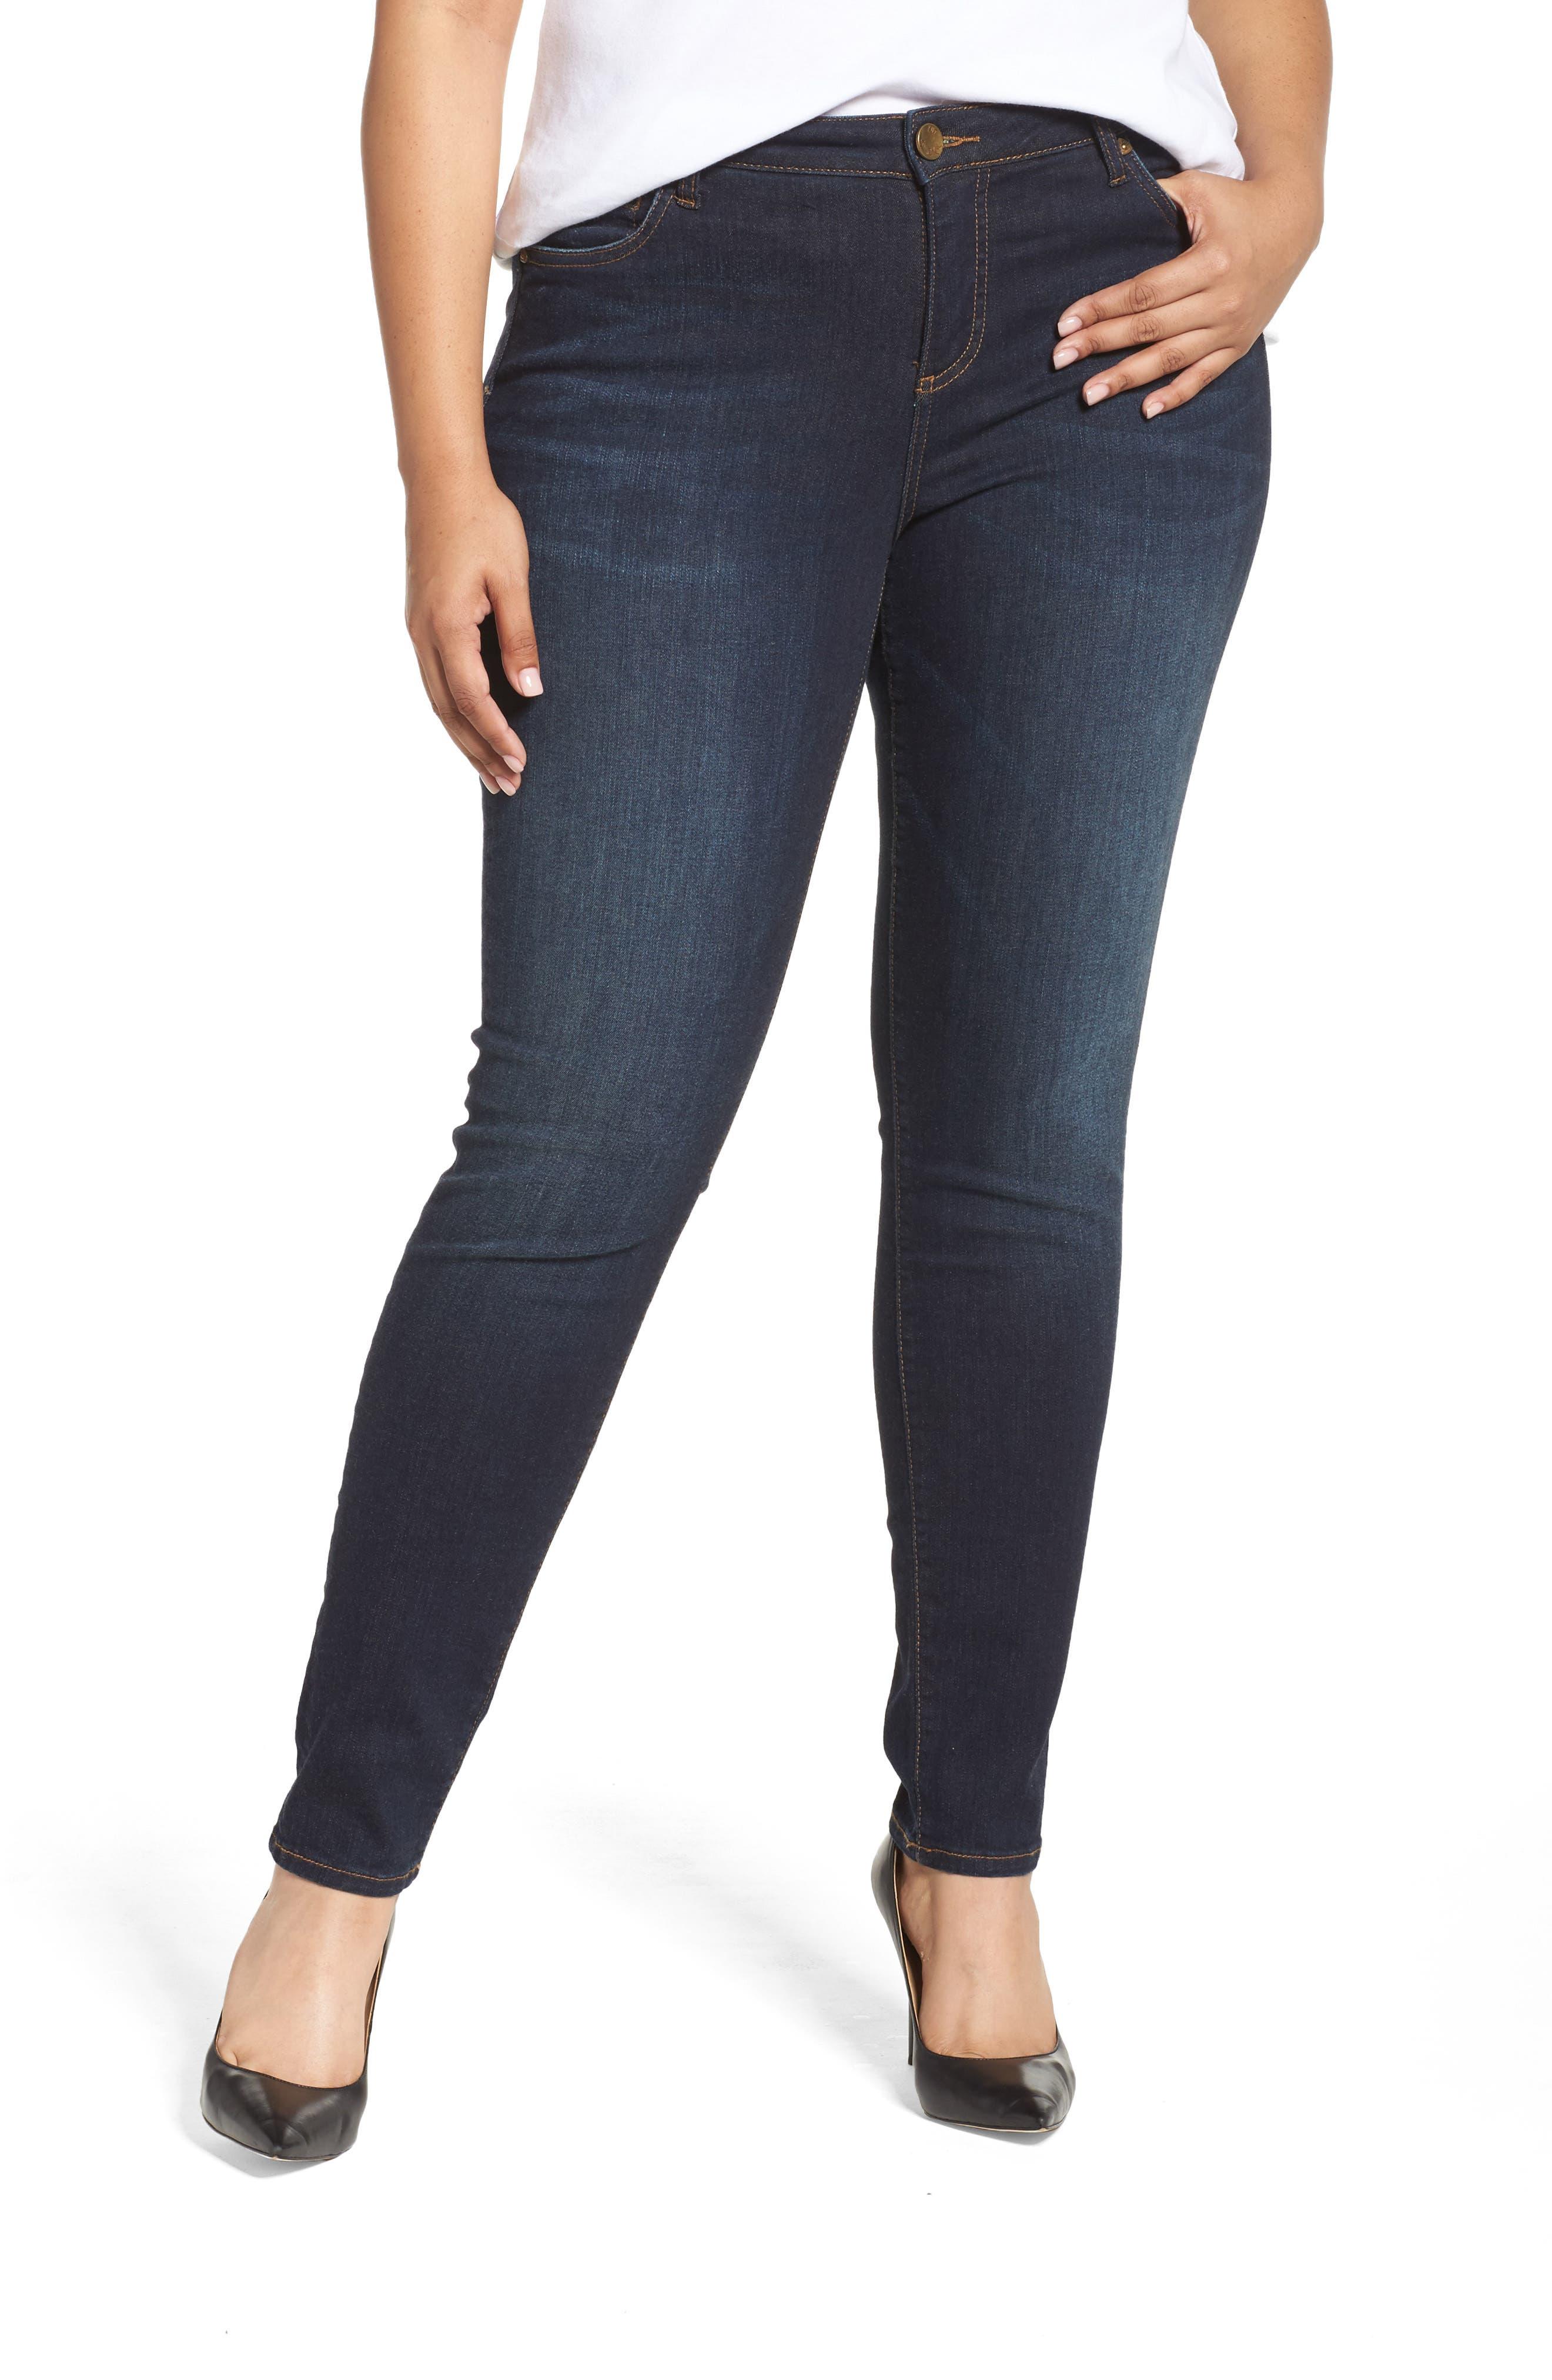 Diana Skinny Jeans,                             Main thumbnail 1, color,                             BLINDING W/ EURO BASE WASH